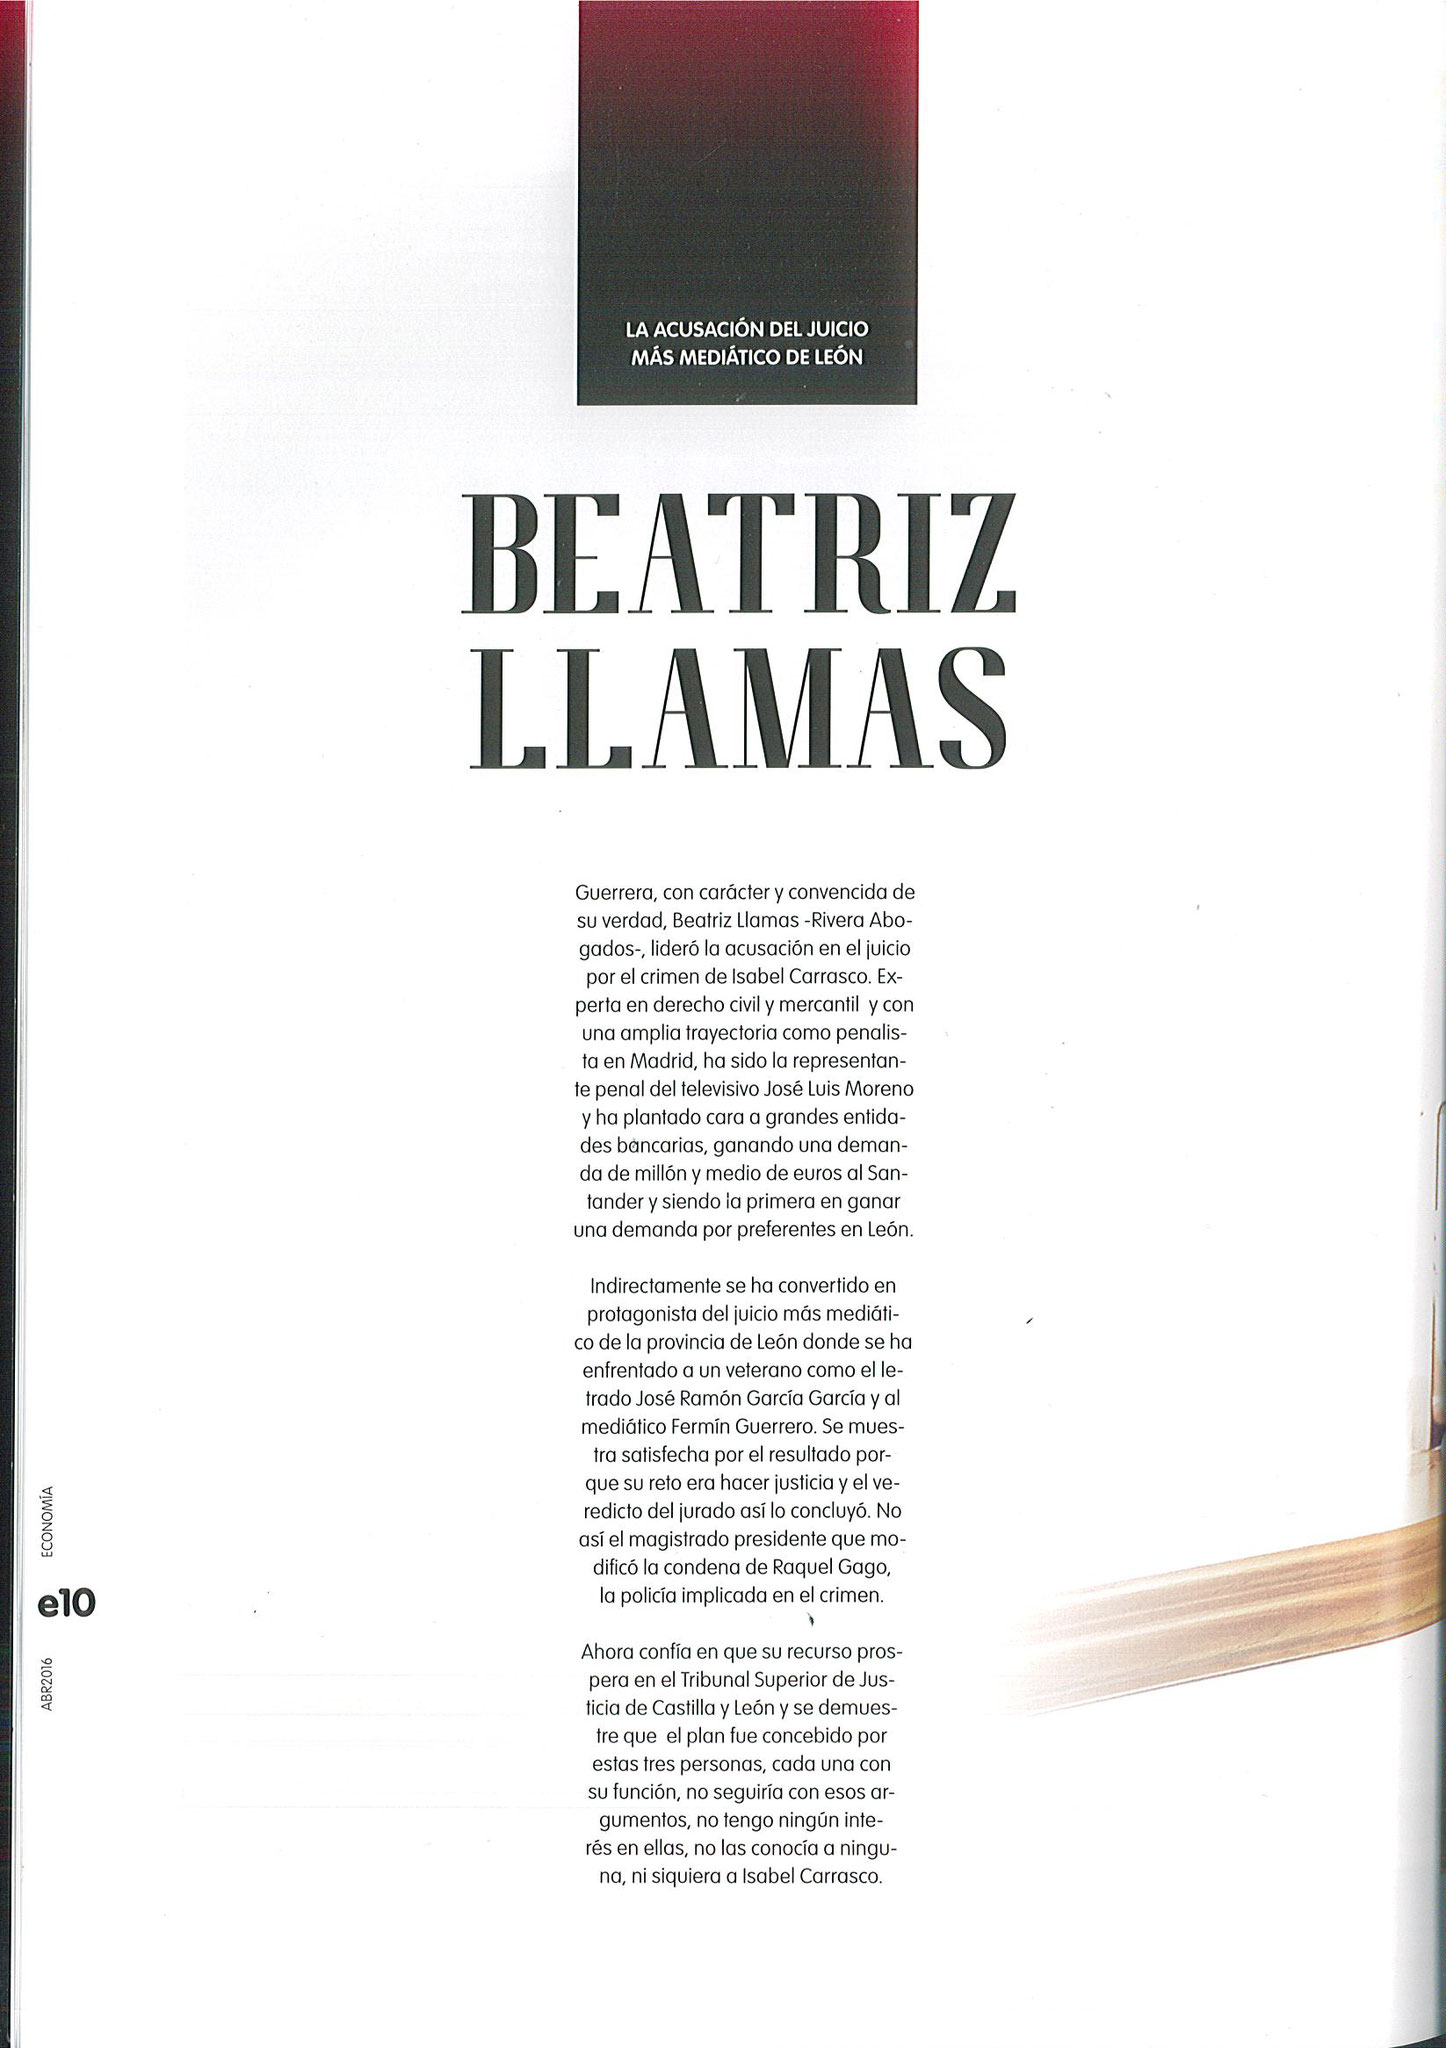 BEATRIZ LLAMAS ABOGADA